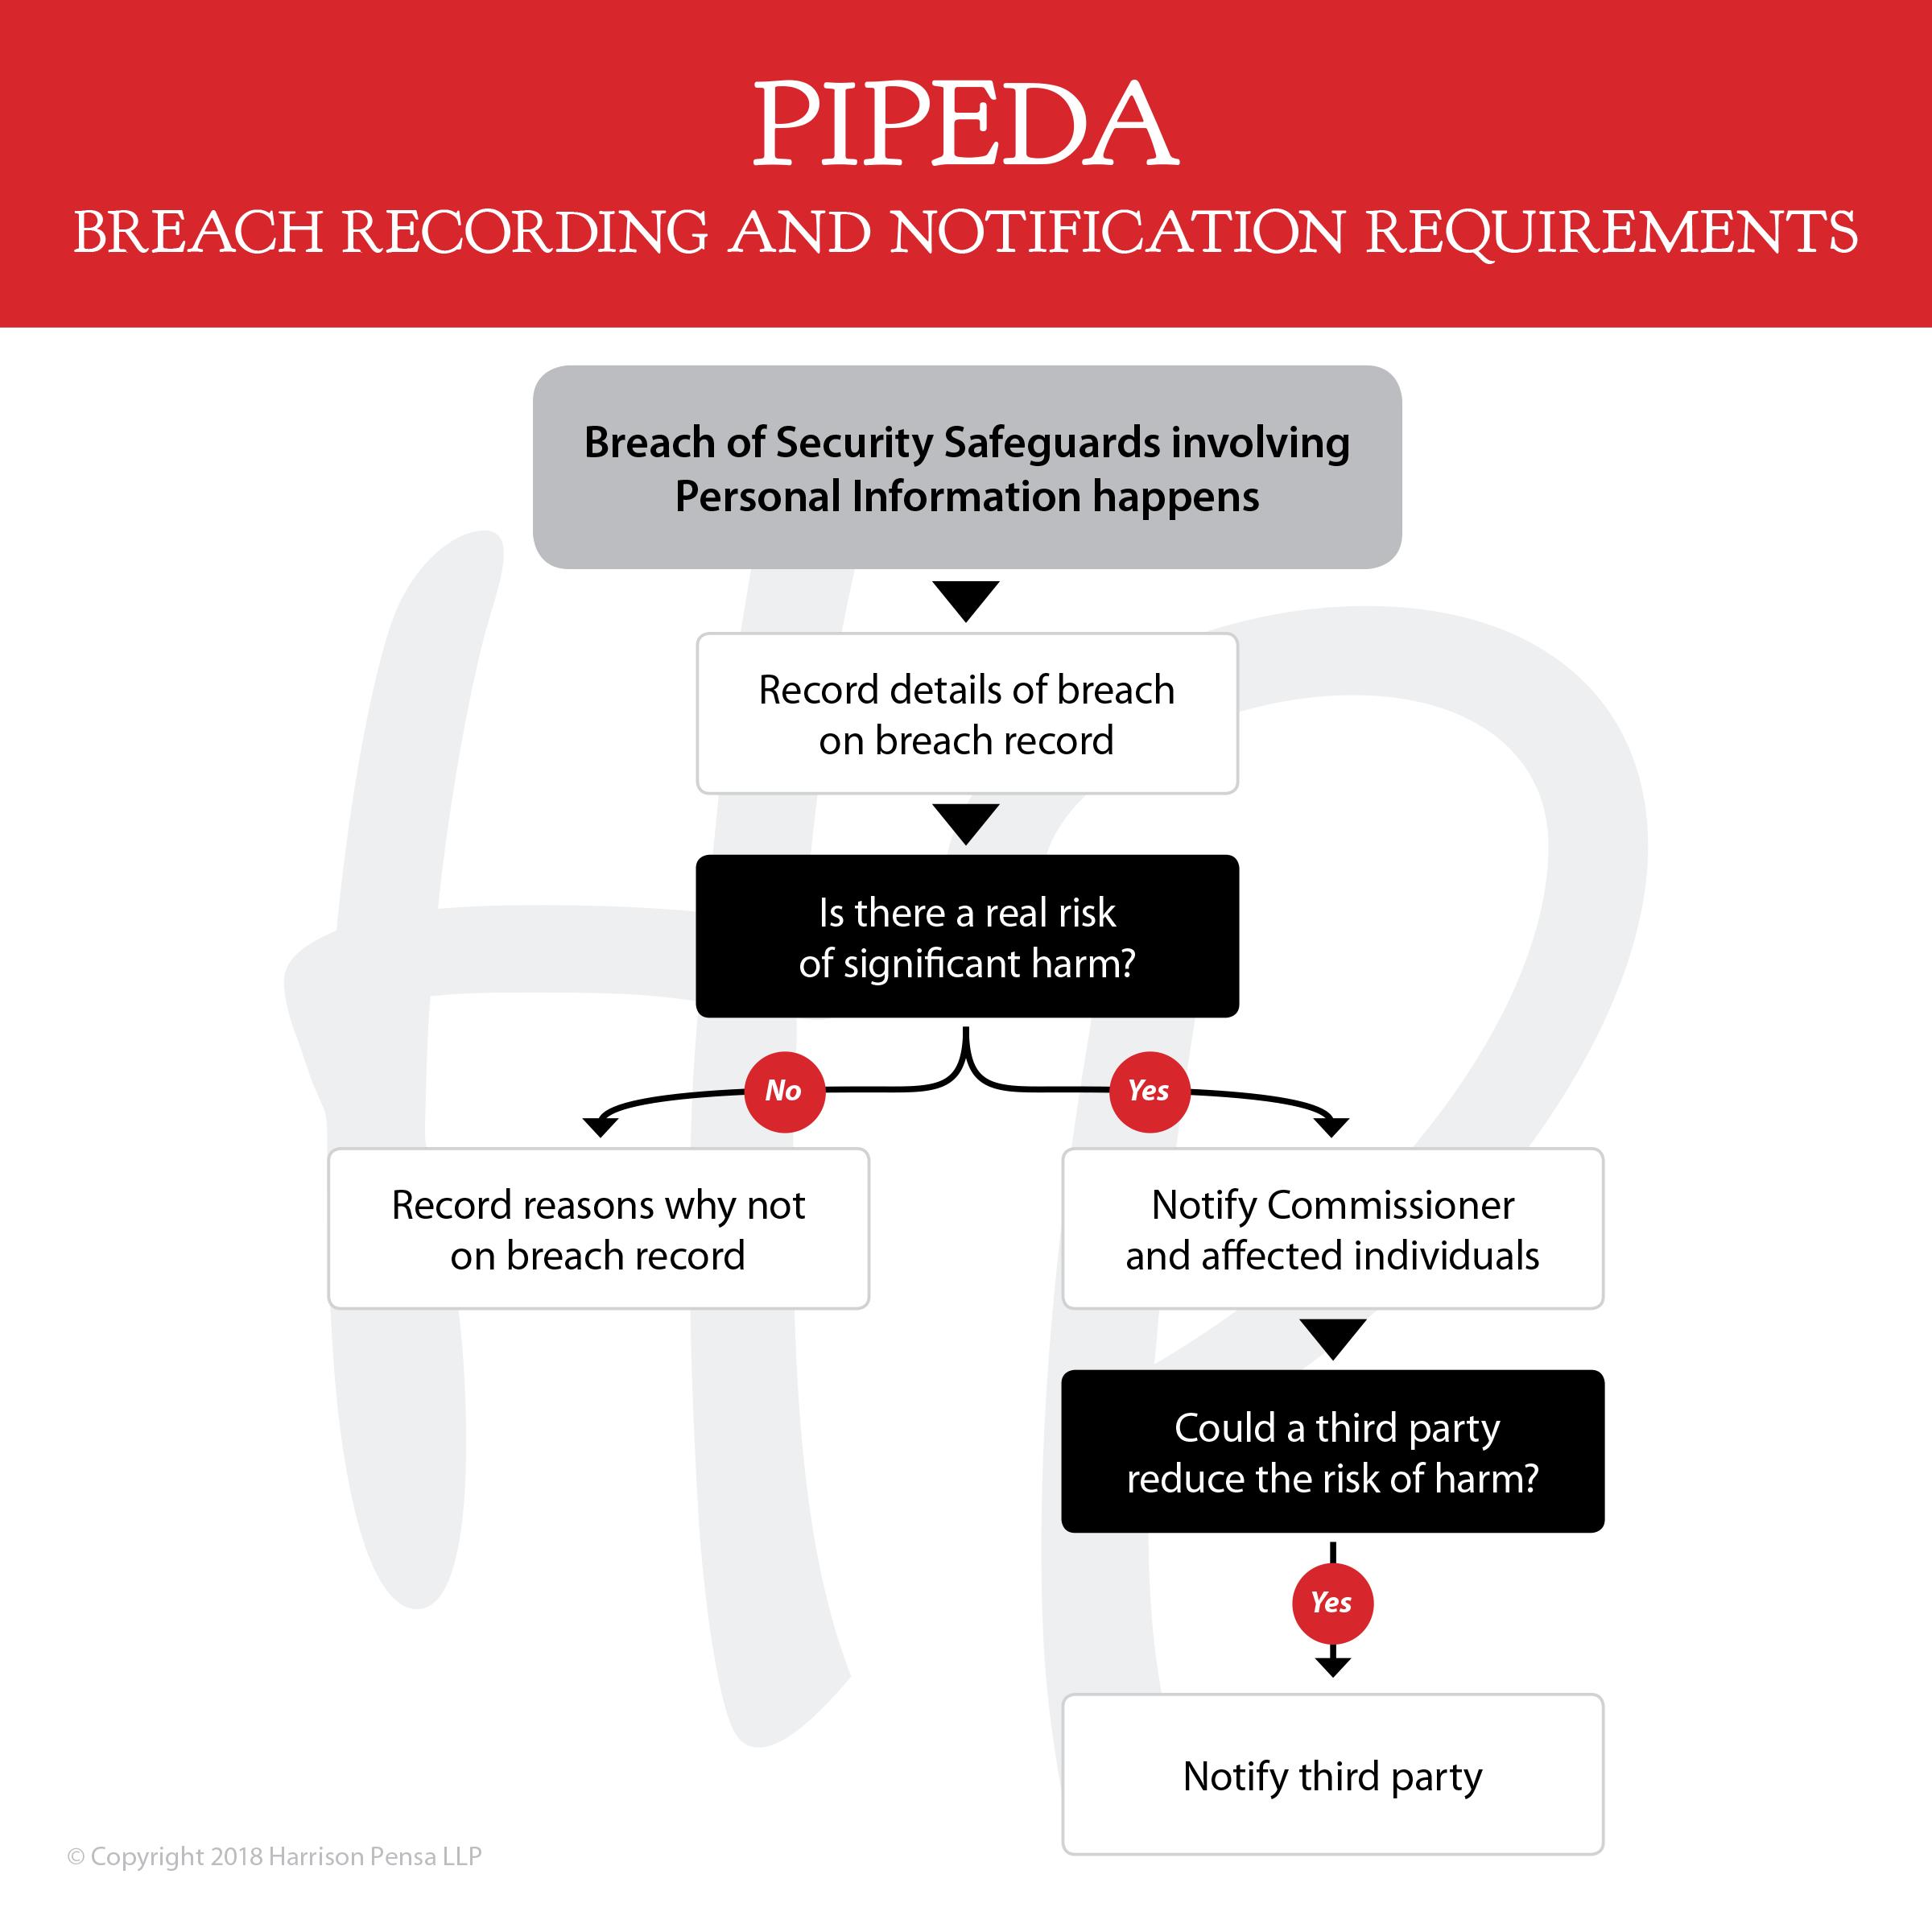 HP-PIPEDA-FlowChart-Web-1018b (1).png